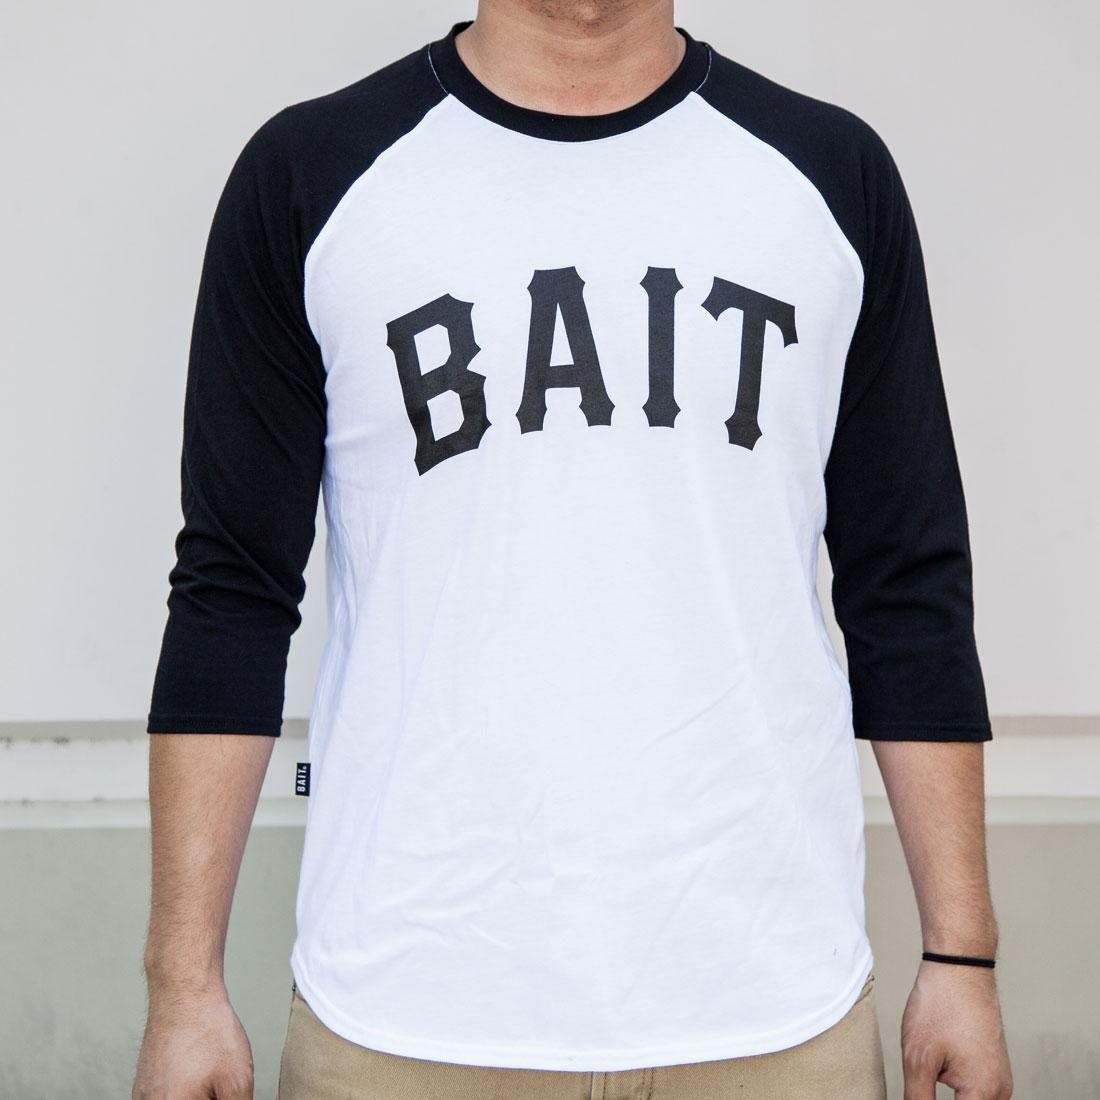 BAIT Men Core Raglan Tee (white / black)